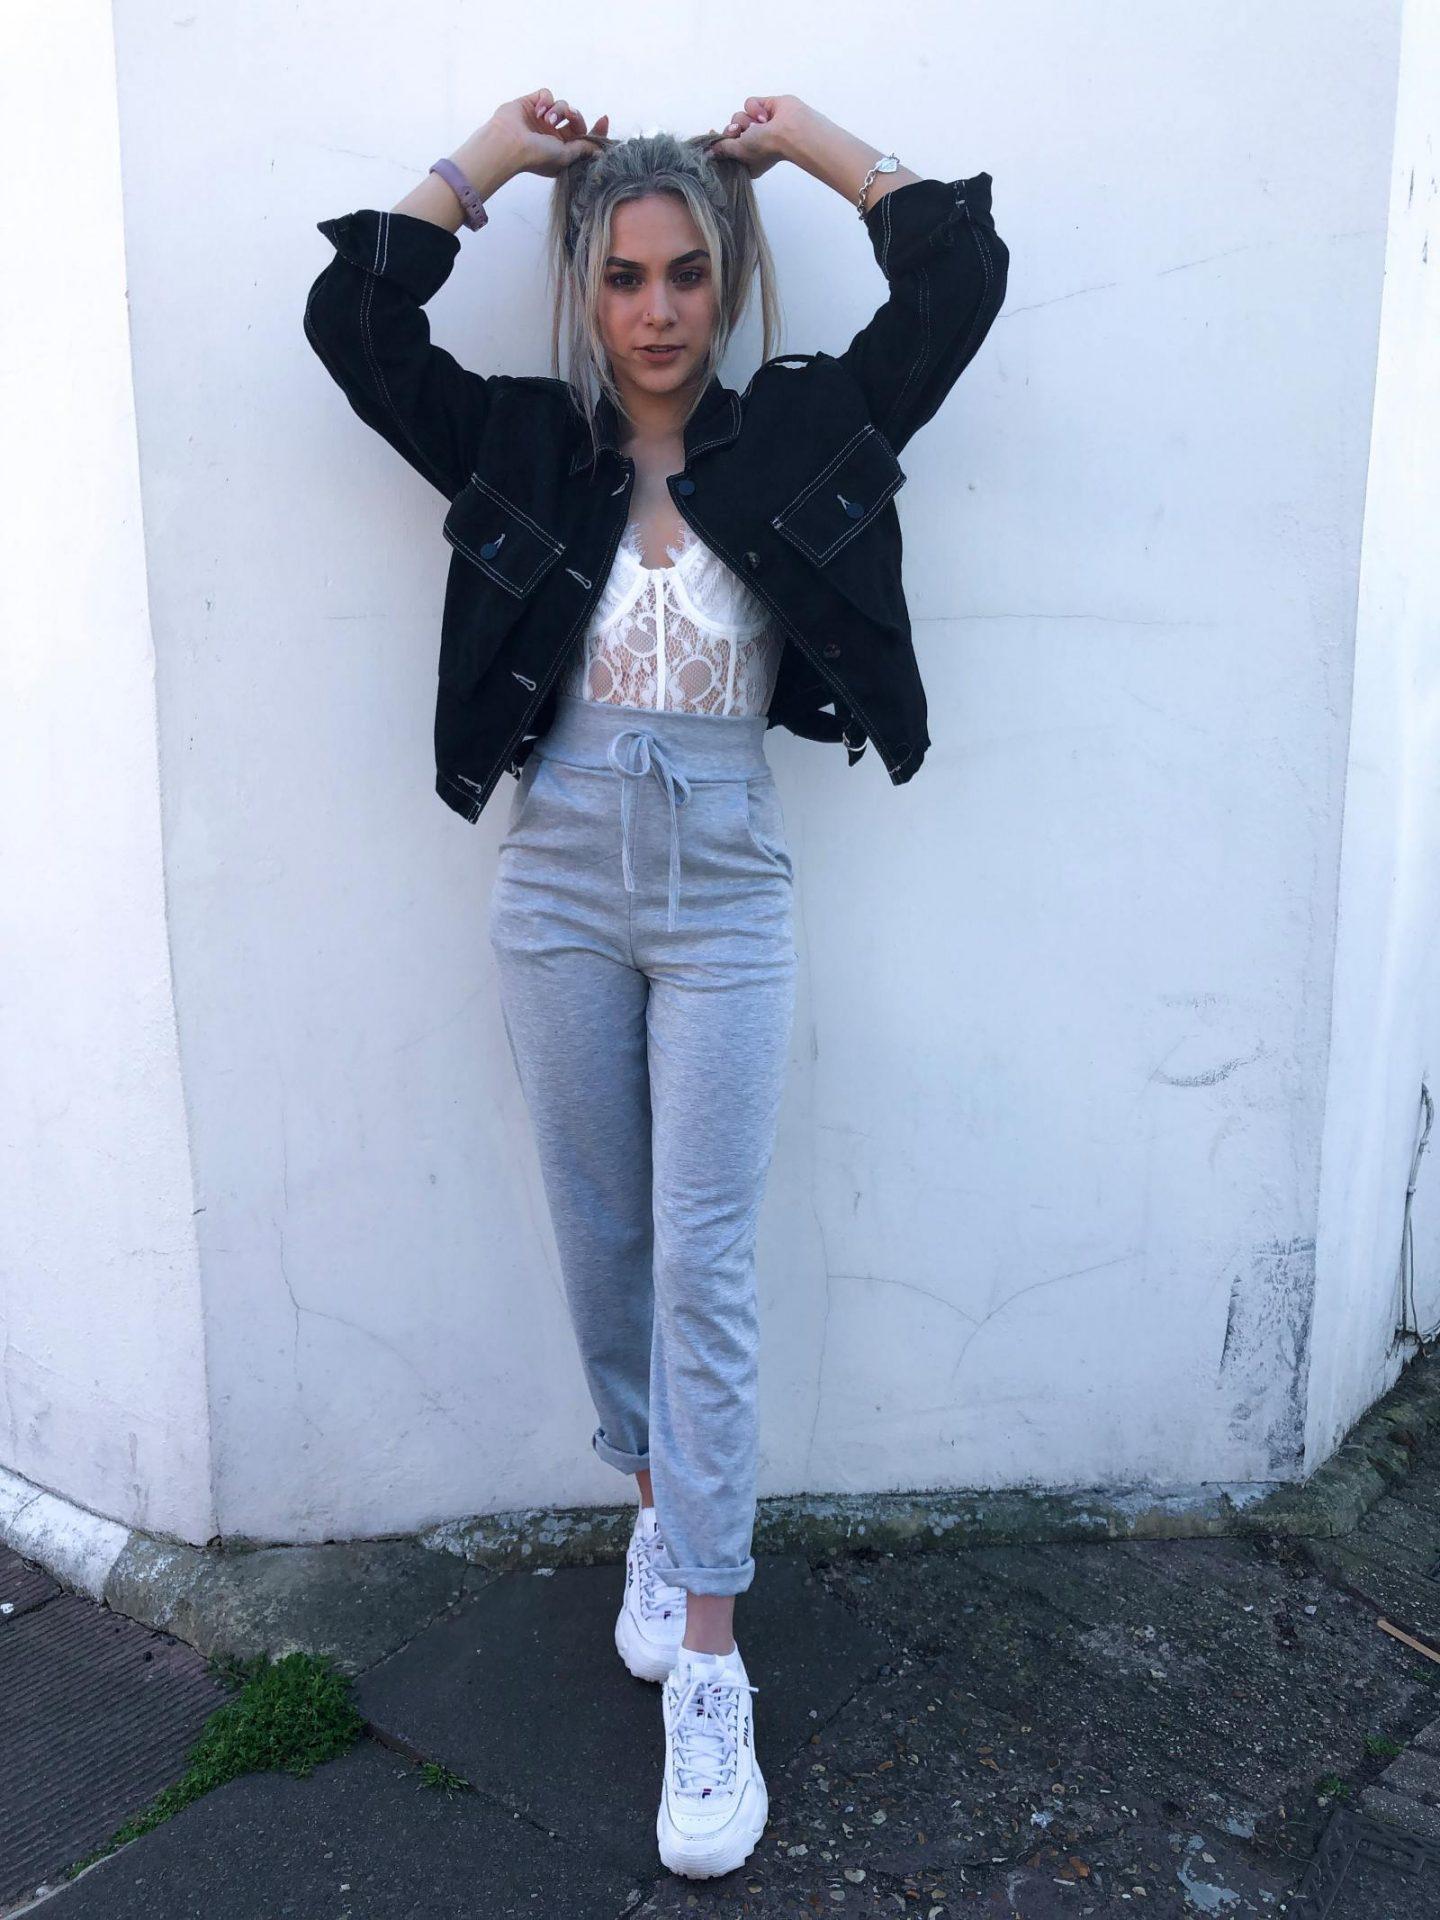 yasmin stefanie missguided plt white lace bodysuit grey joggers